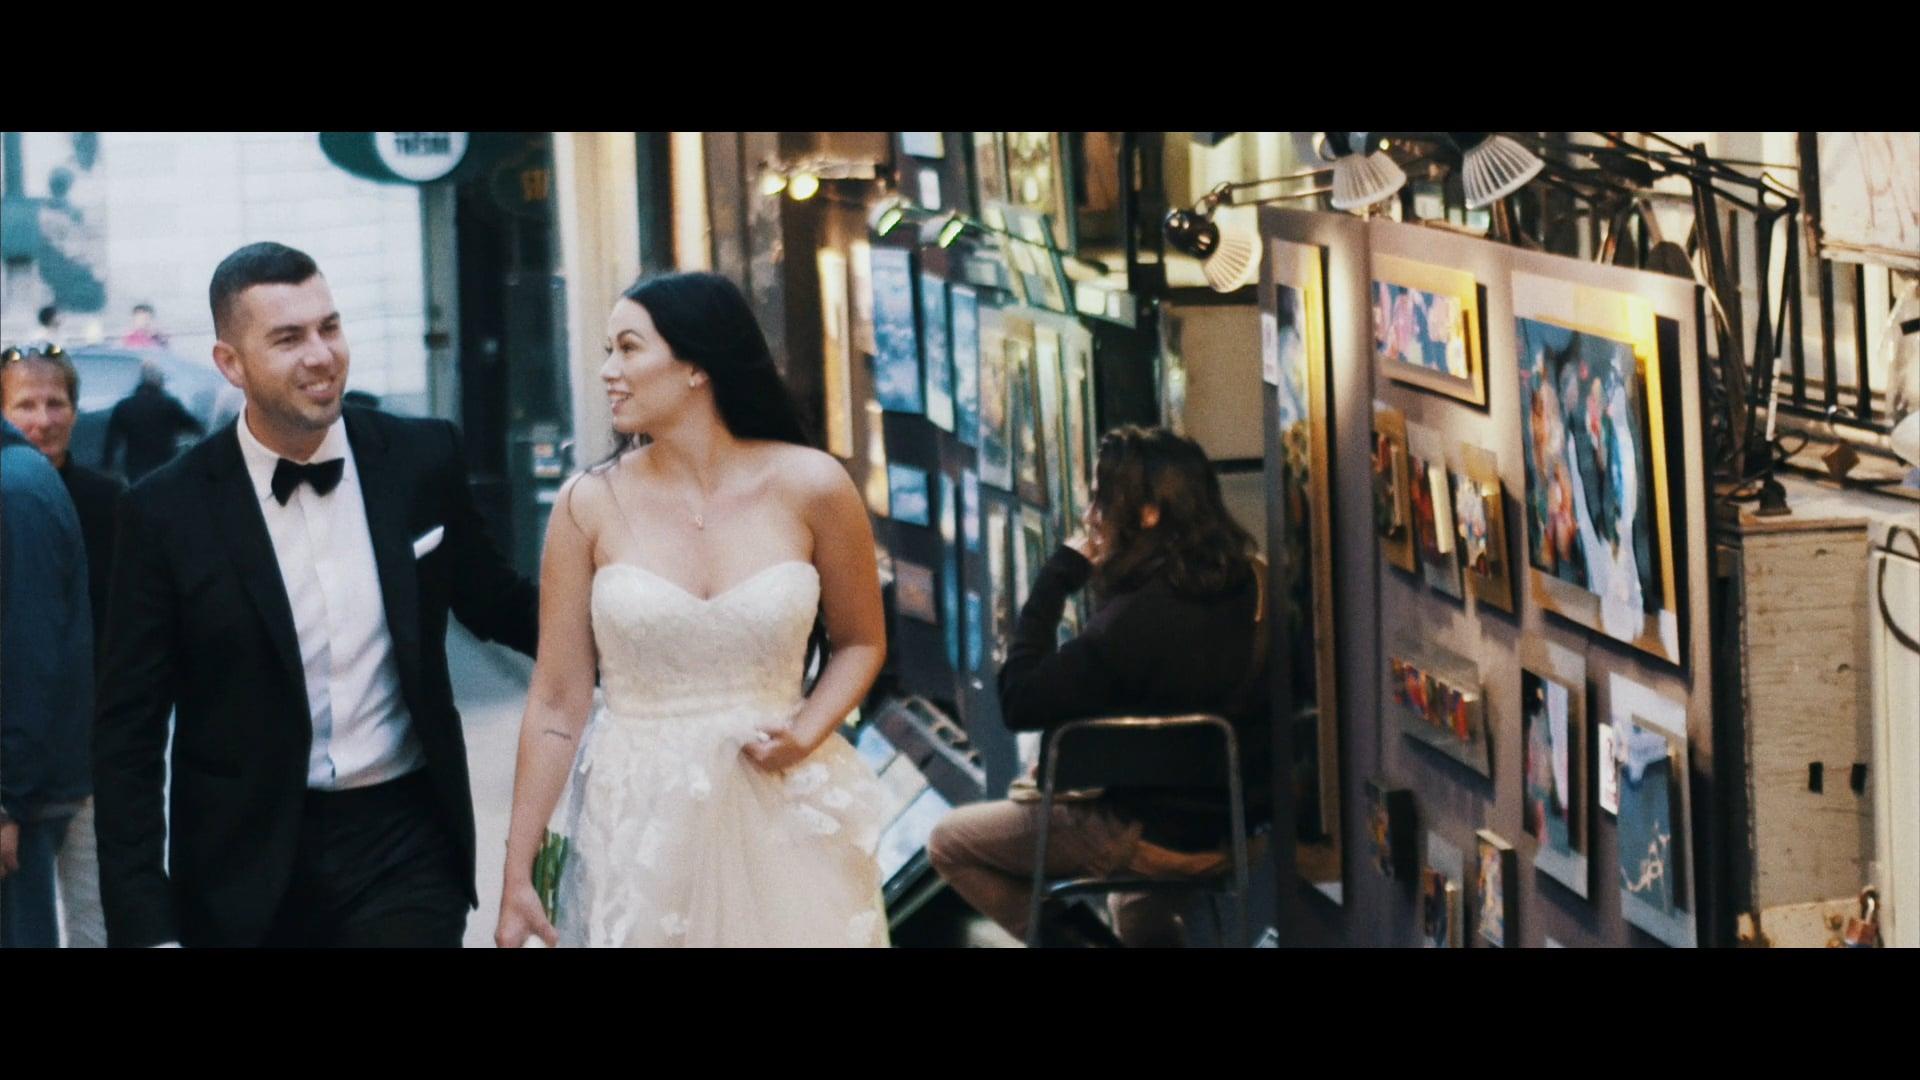 Marie Rose & Yanik - Highlights